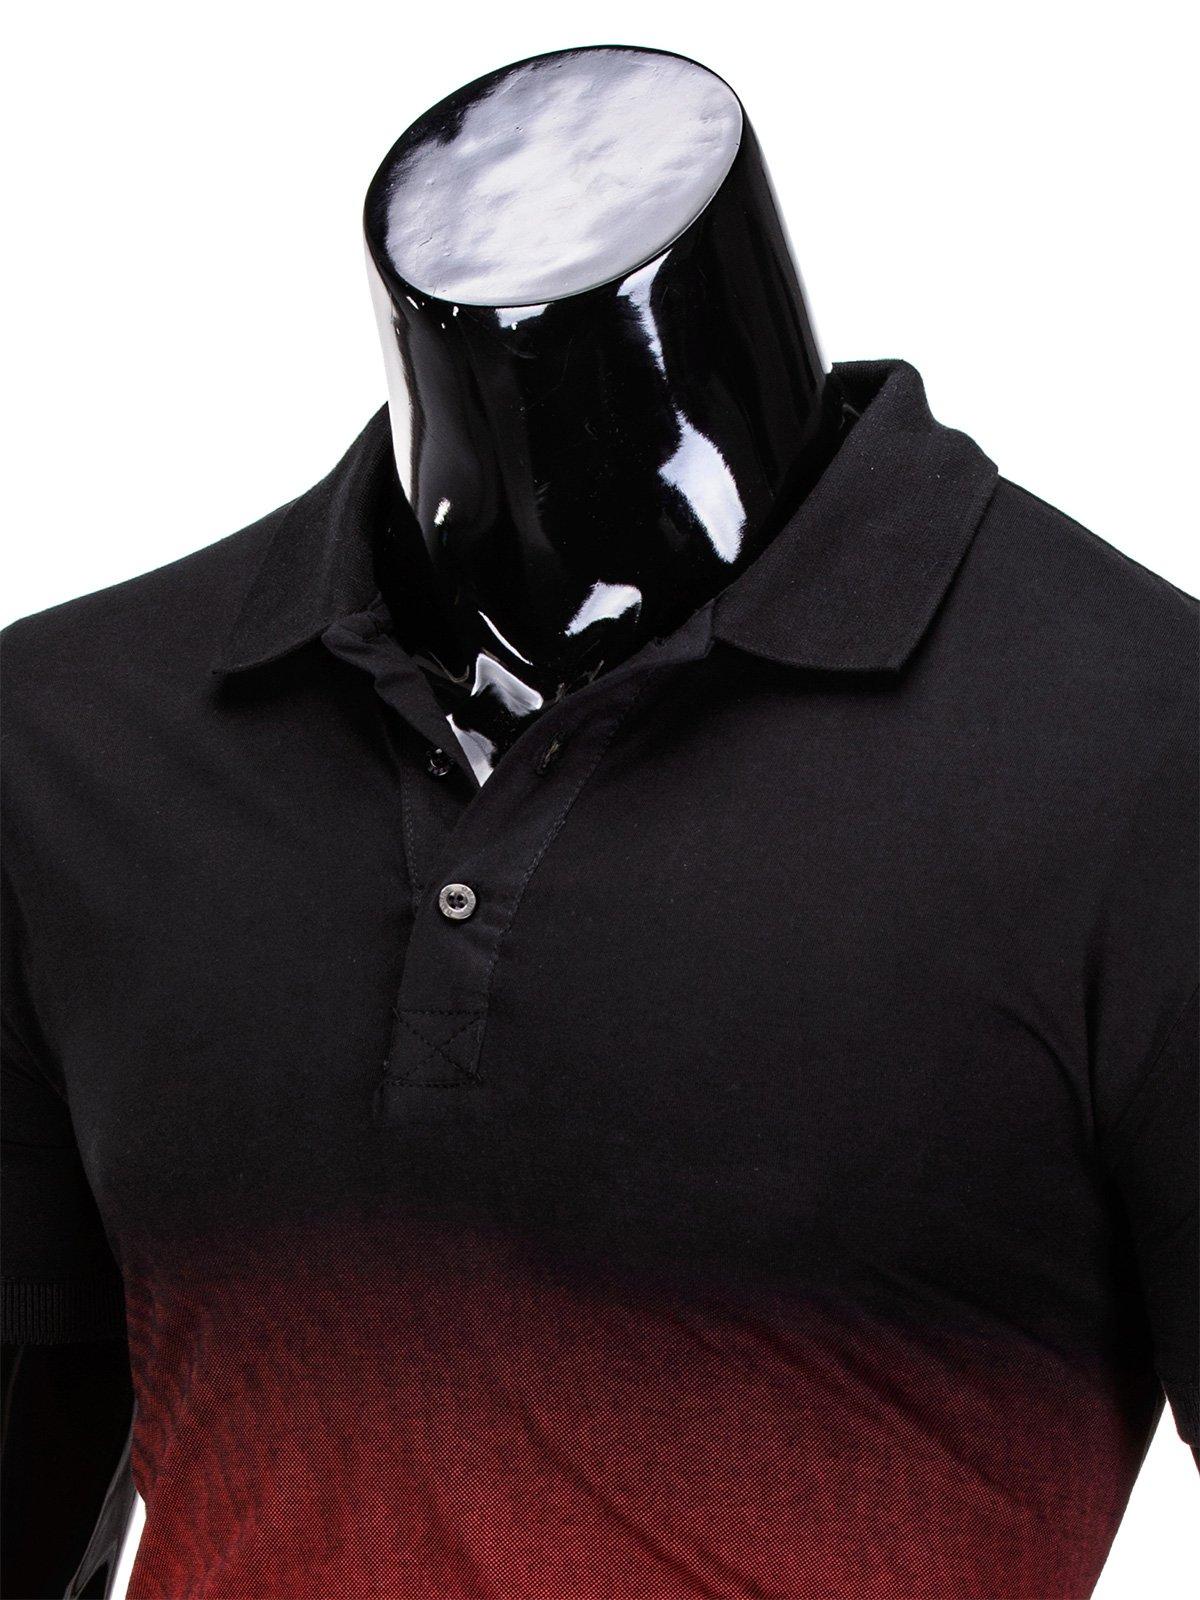 fb16c344 Wholesale Mens Polo Style Shirts - DREAMWORKS